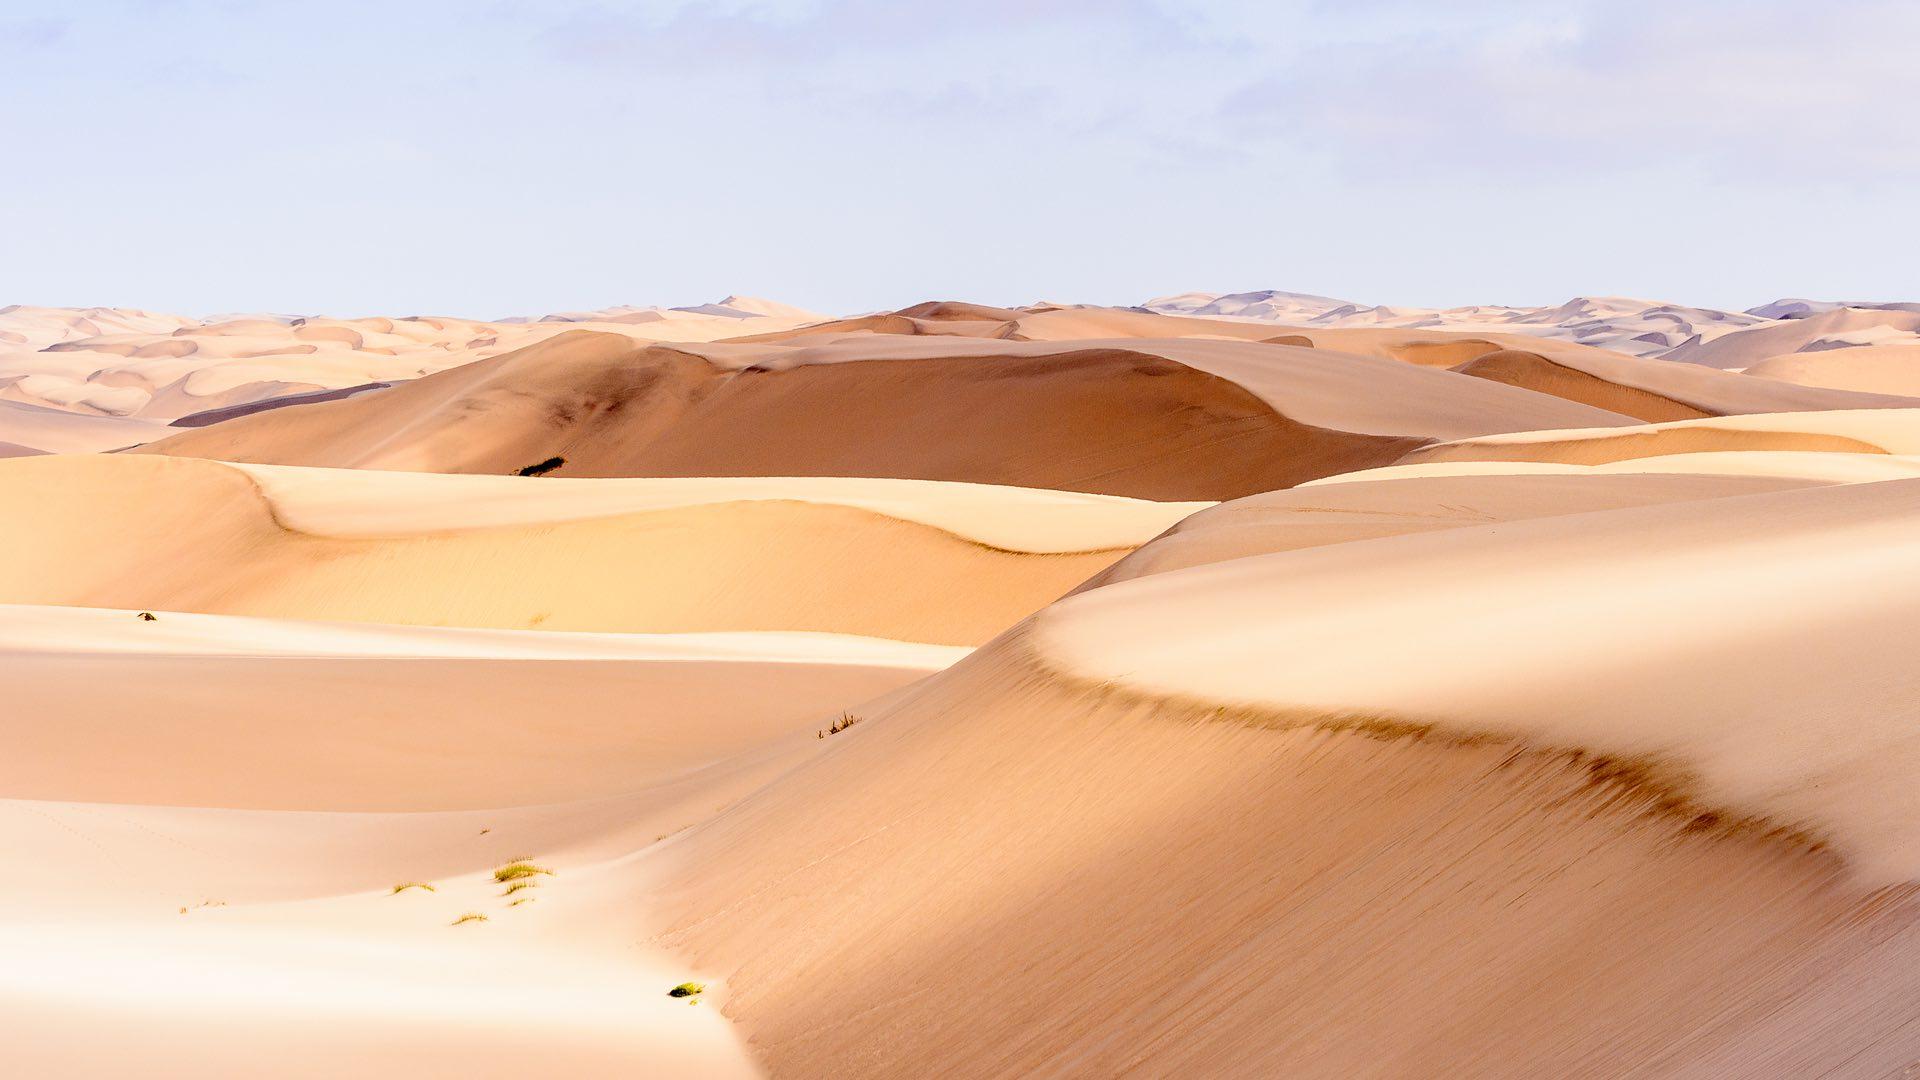 Afrika | Namibia  | ©Anton-Ivanov/Shutterstock.com